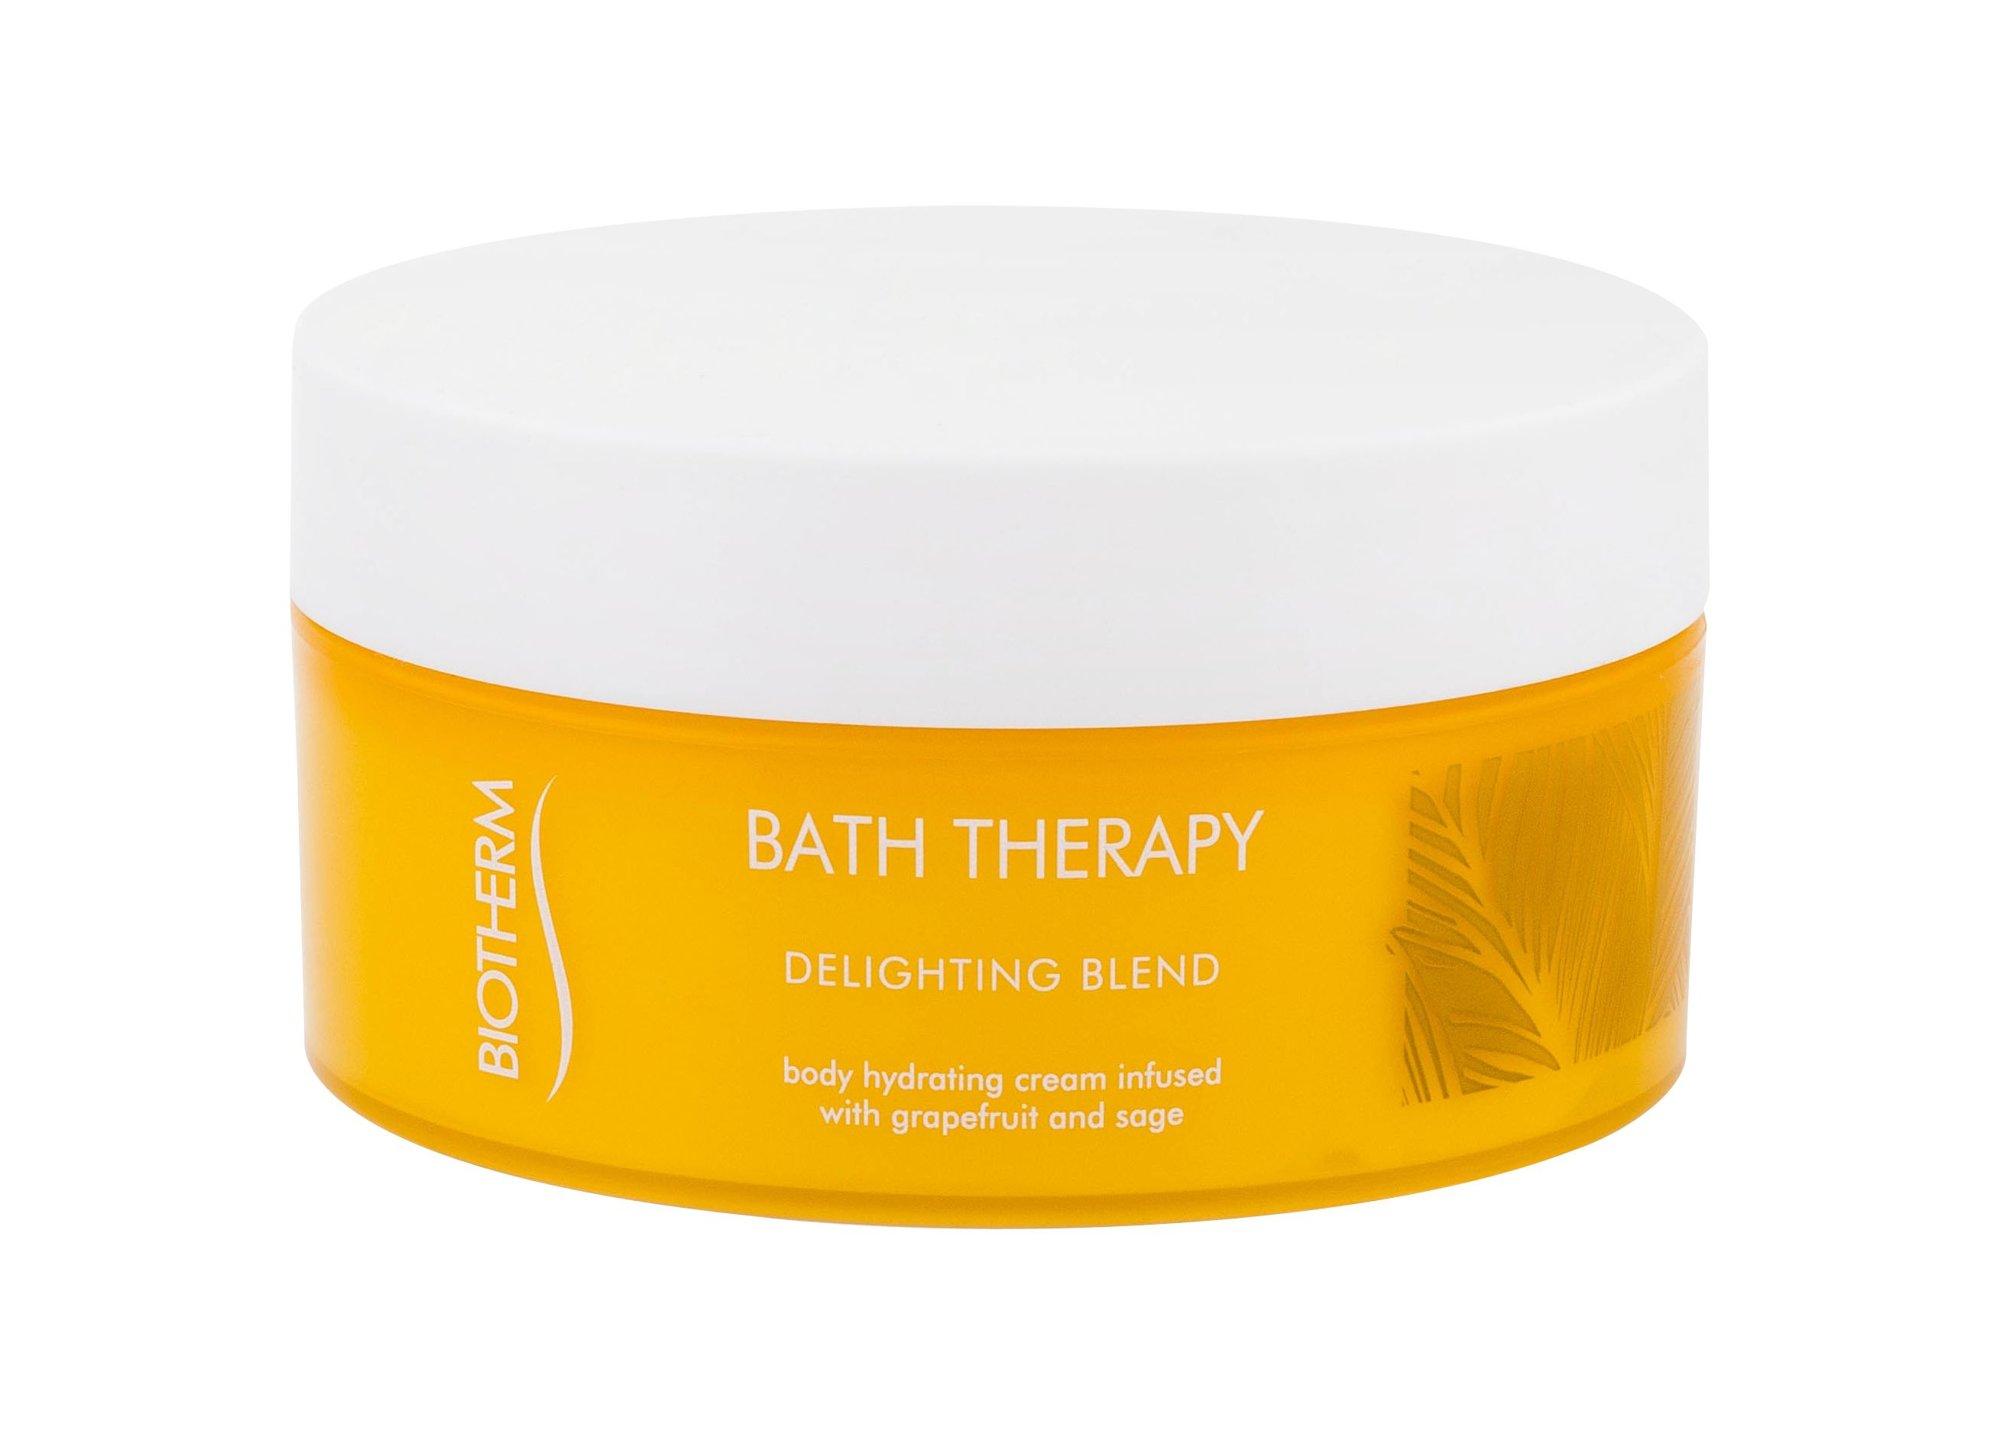 Biotherm Bath Therapy Body Cream 200ml  Delighting Blend